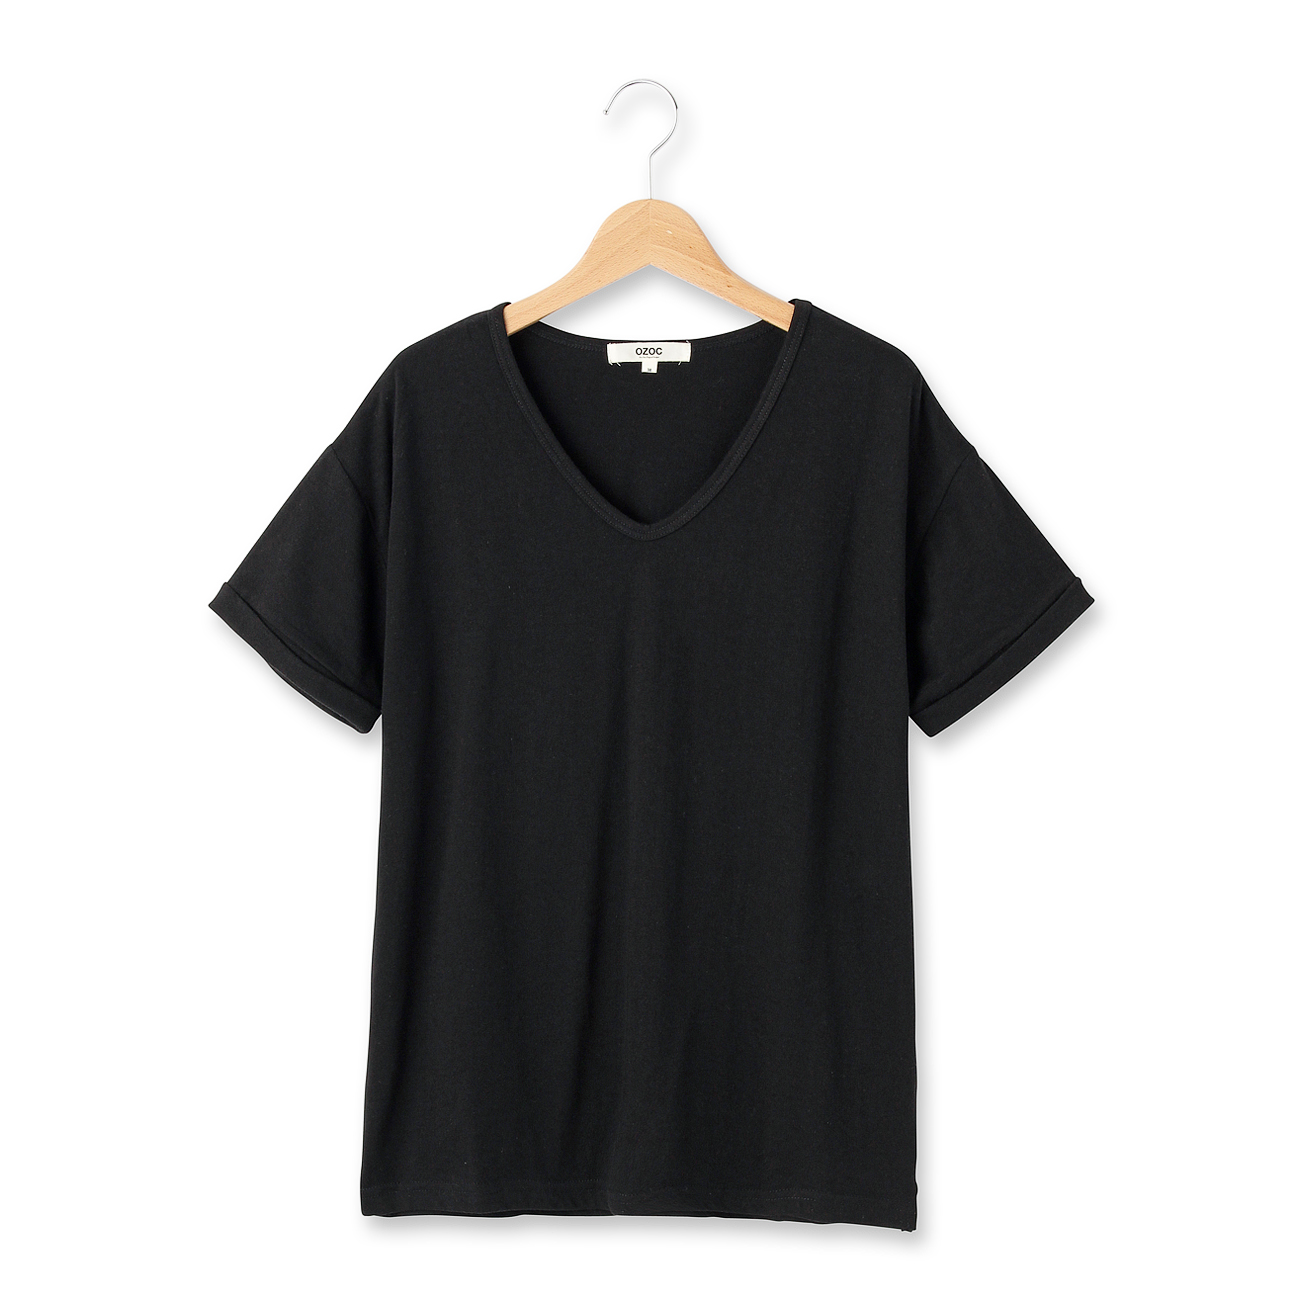 【OZOC (オゾック)】Vネックベーシックプルオーバーレディース トップス|カットソー・Tシャツ ブラック